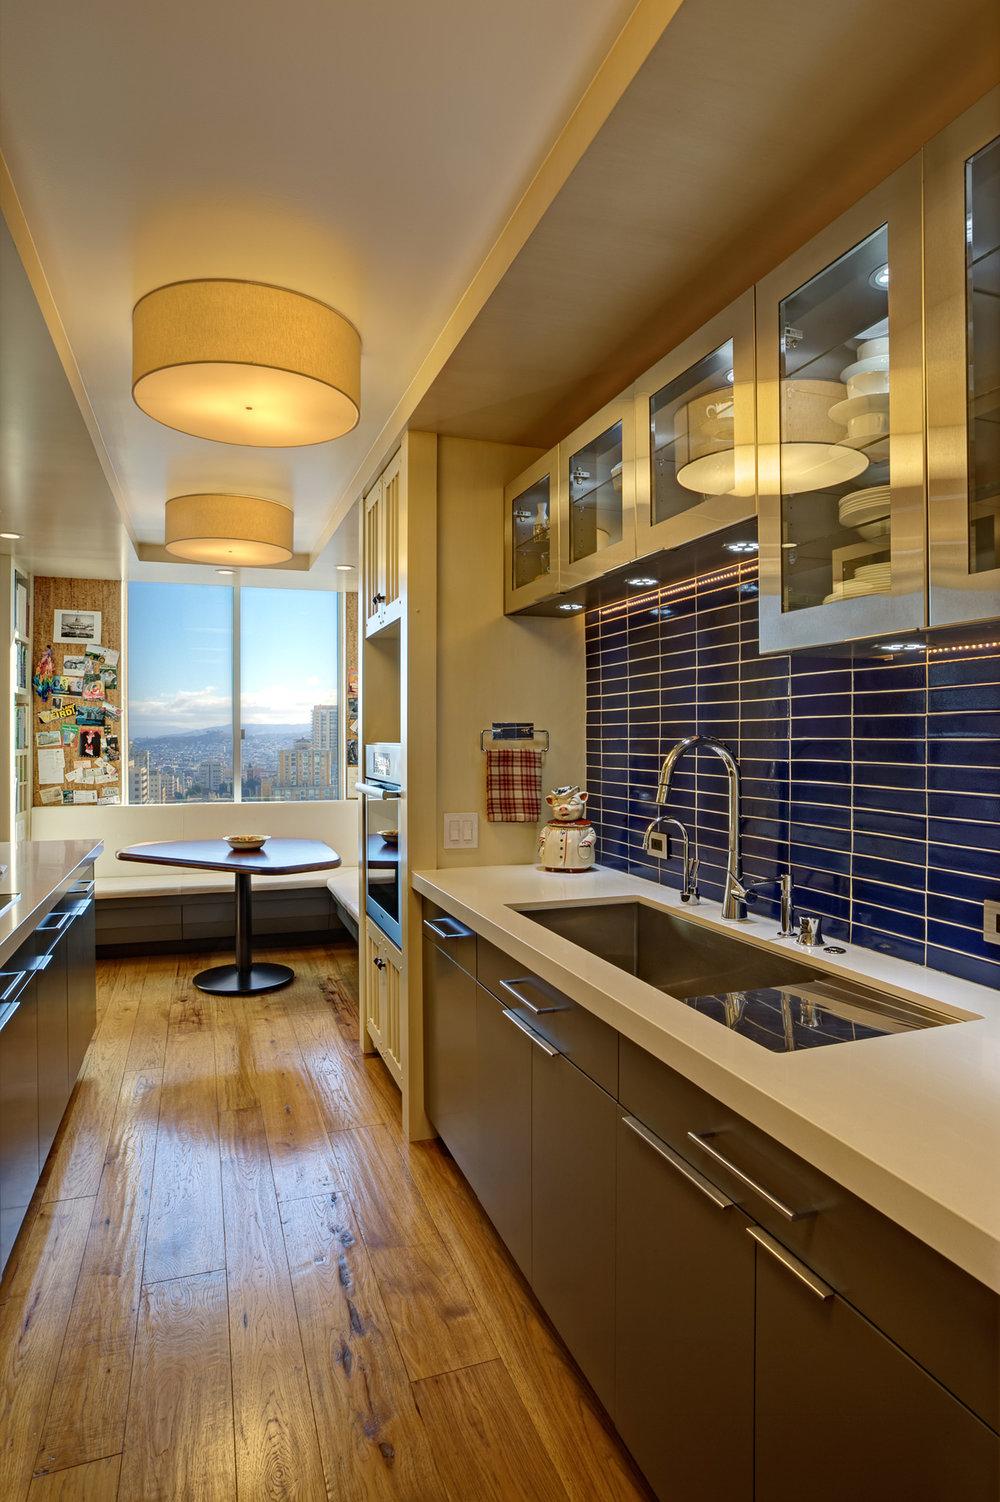 Kaplan-Architects-high-rise-interior-remodeled-kitchen-stainless-steel-sink.jpg